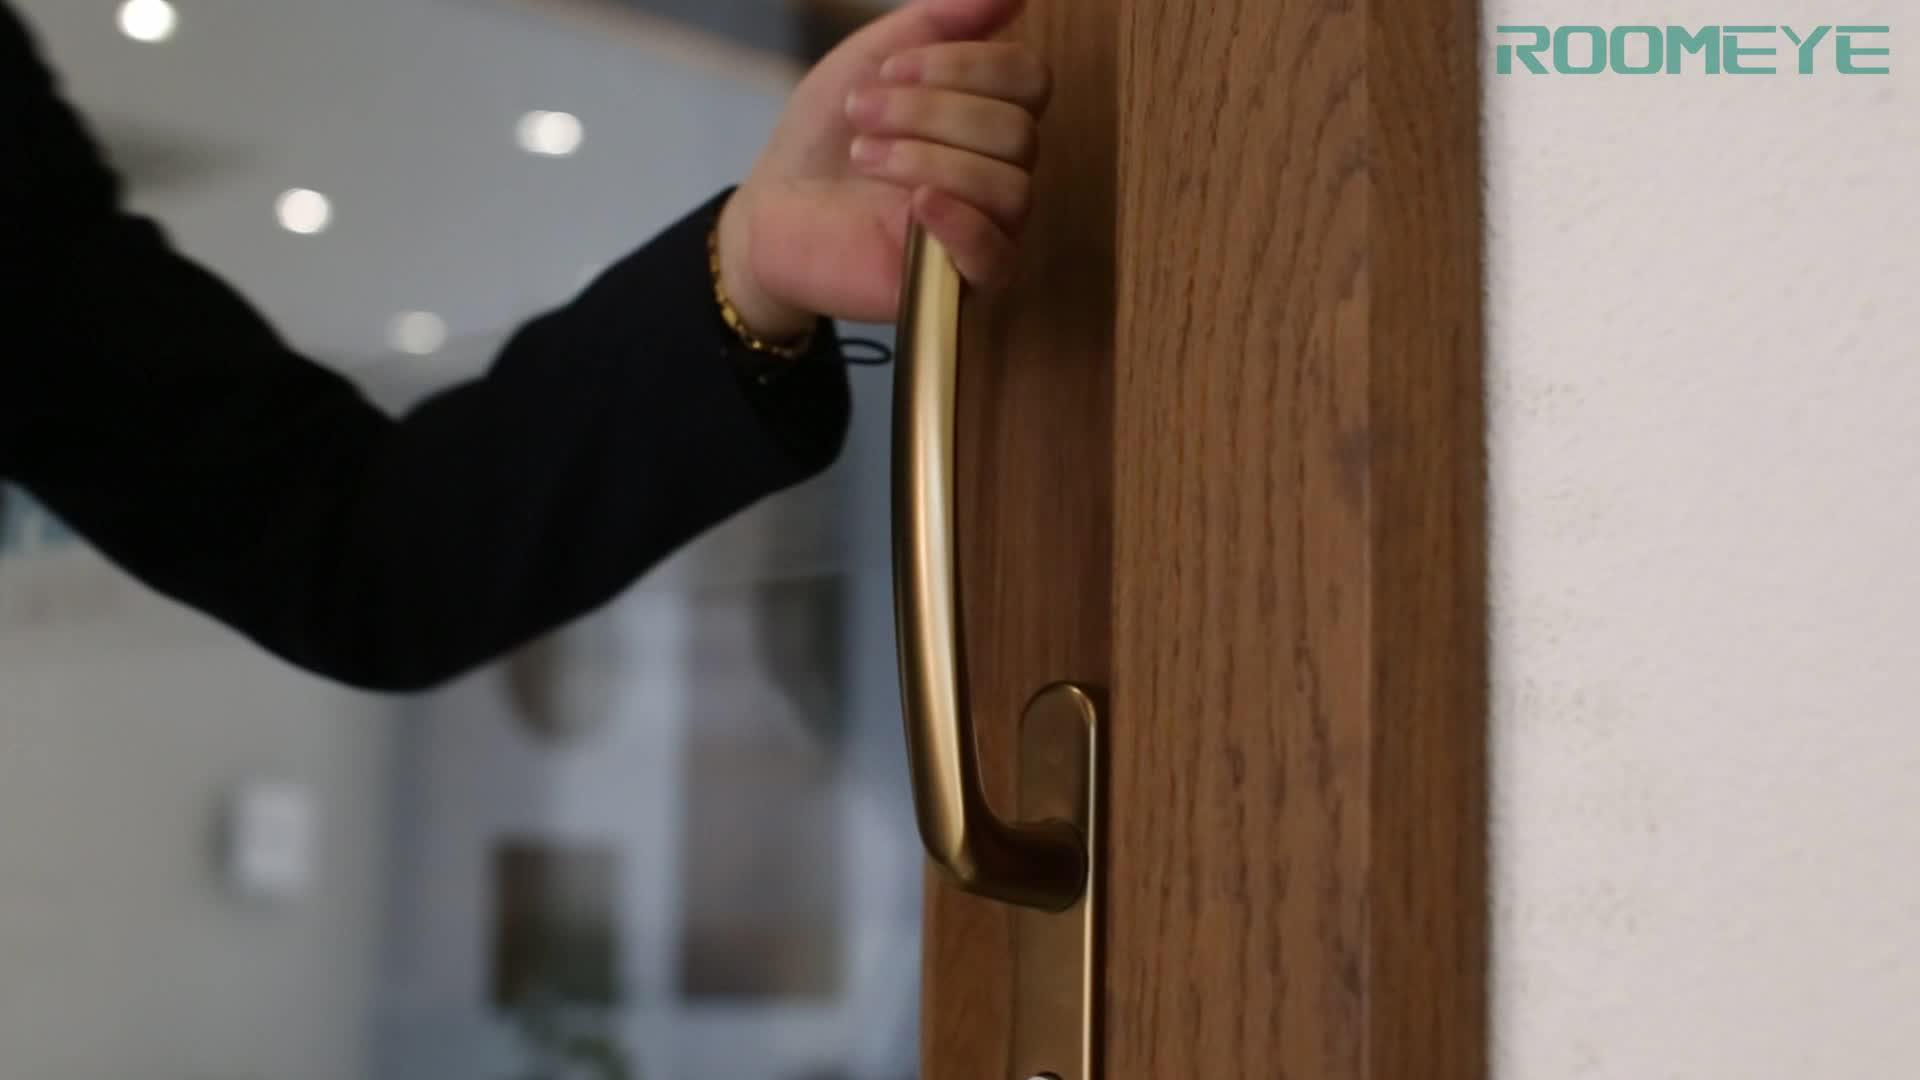 लकड़ी एल्यूमीनियम डबल घुटा हुआ बालकनी रपट कांच दरवाजा